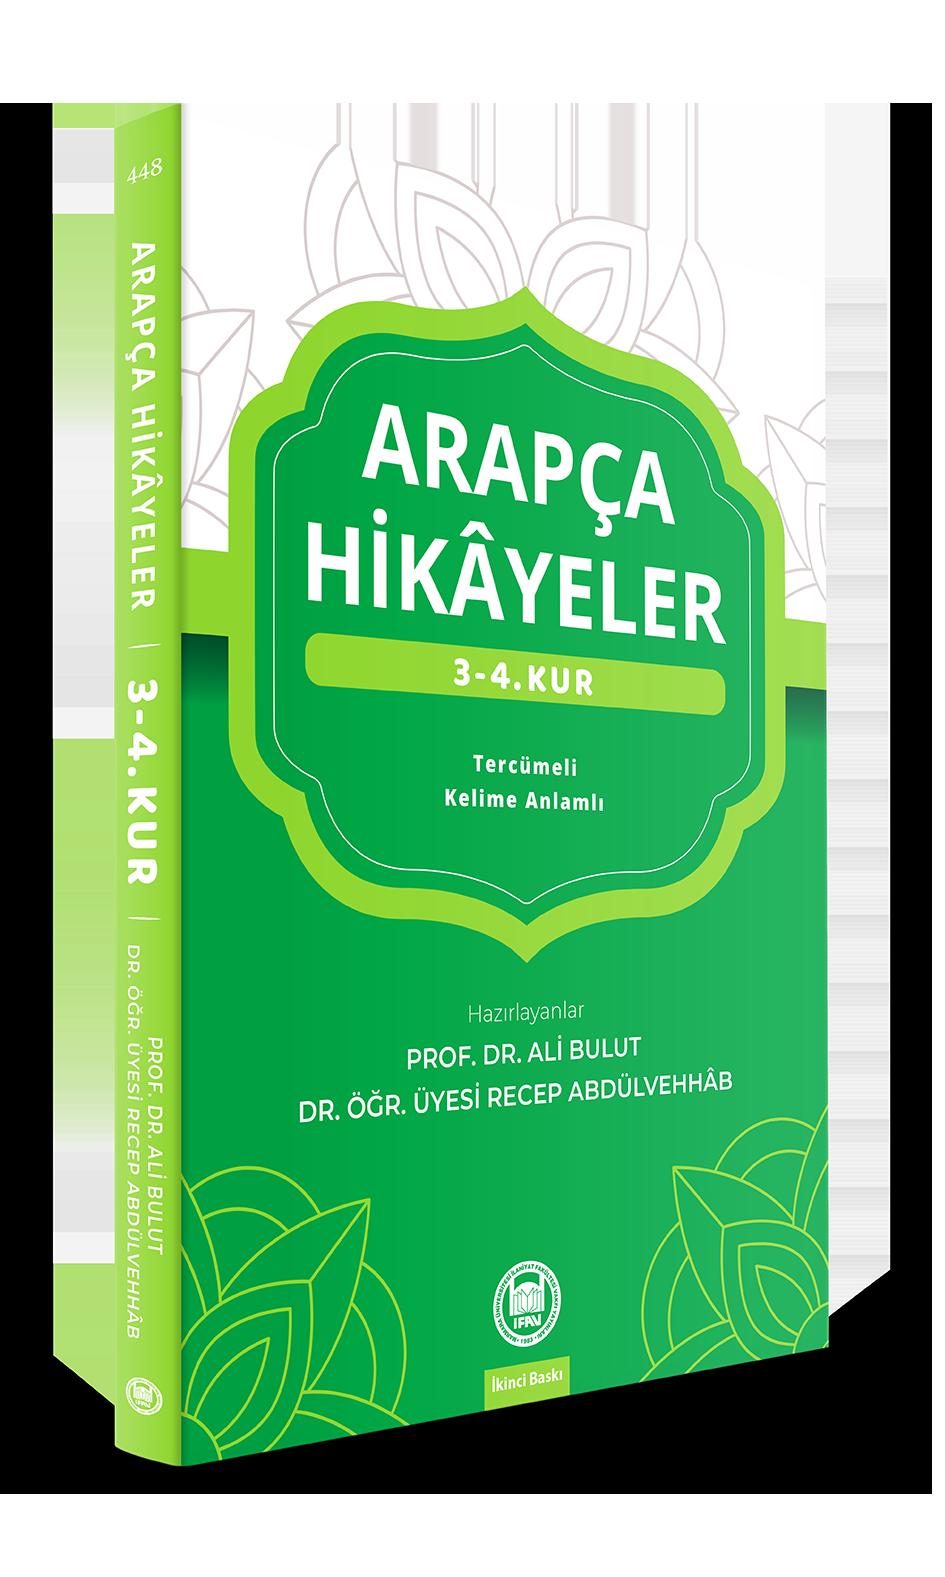 Arapça Hikayeler 3 - 4. Kur